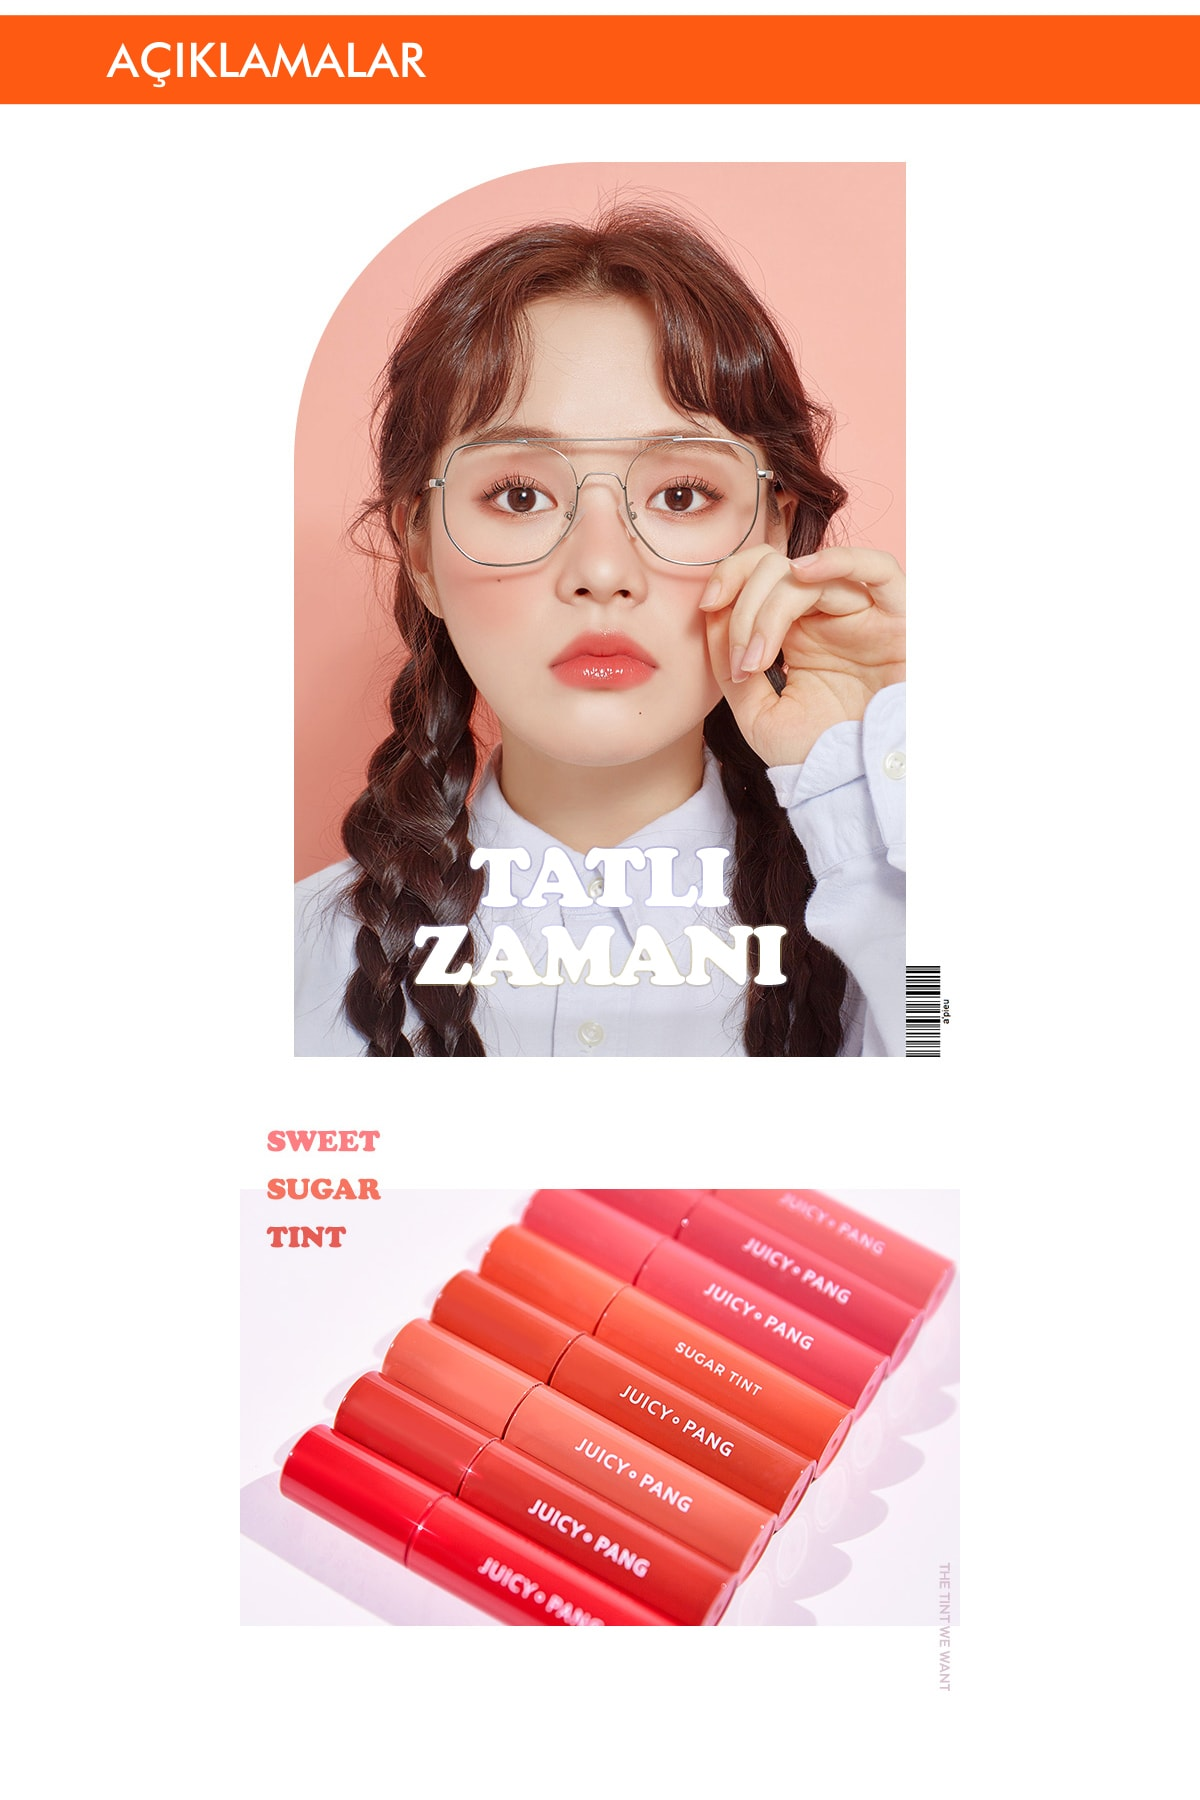 Missha Uzun Süre Kalıcı Parlak Su Bazlı Jel Tint APIEU Juicy-Pang Sugar Tint (PK01) 1